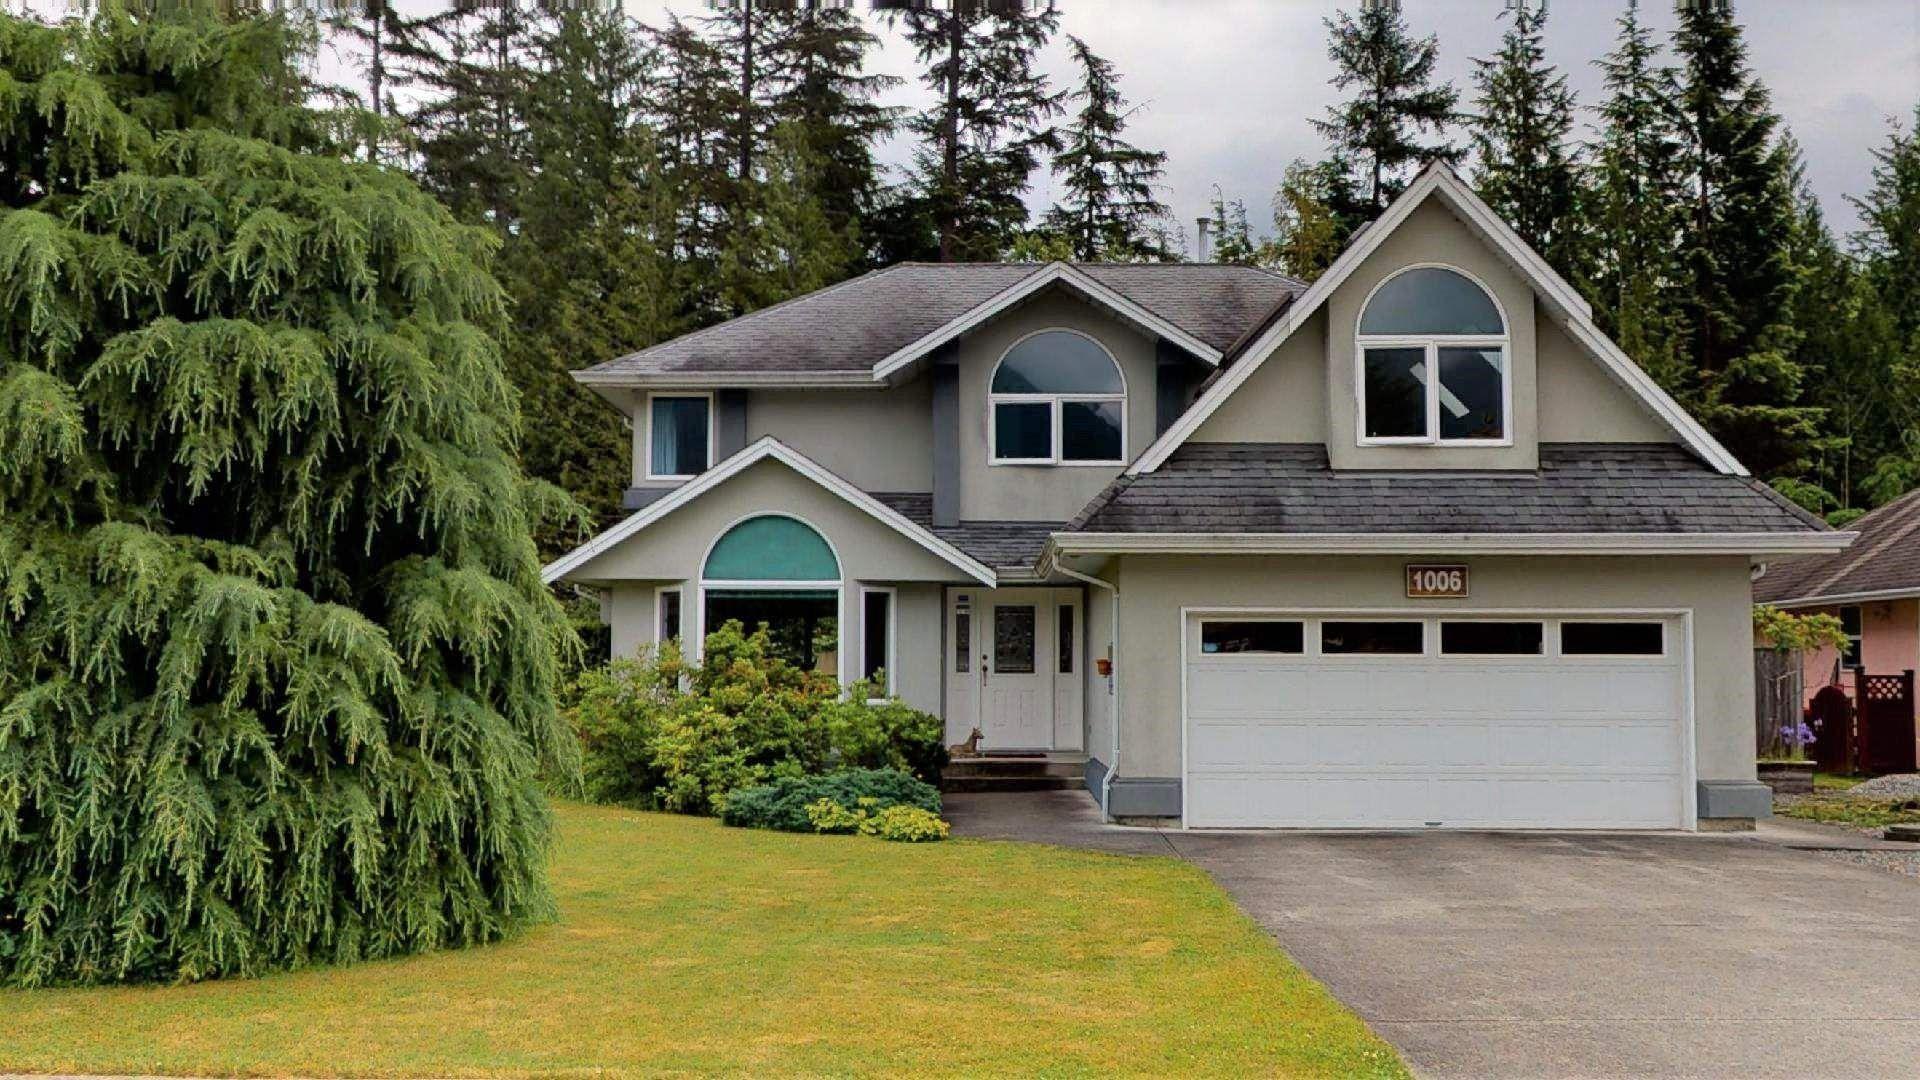 Main Photo: 1006 REGENCY Place in Squamish: Garibaldi Estates House for sale : MLS®# R2595112